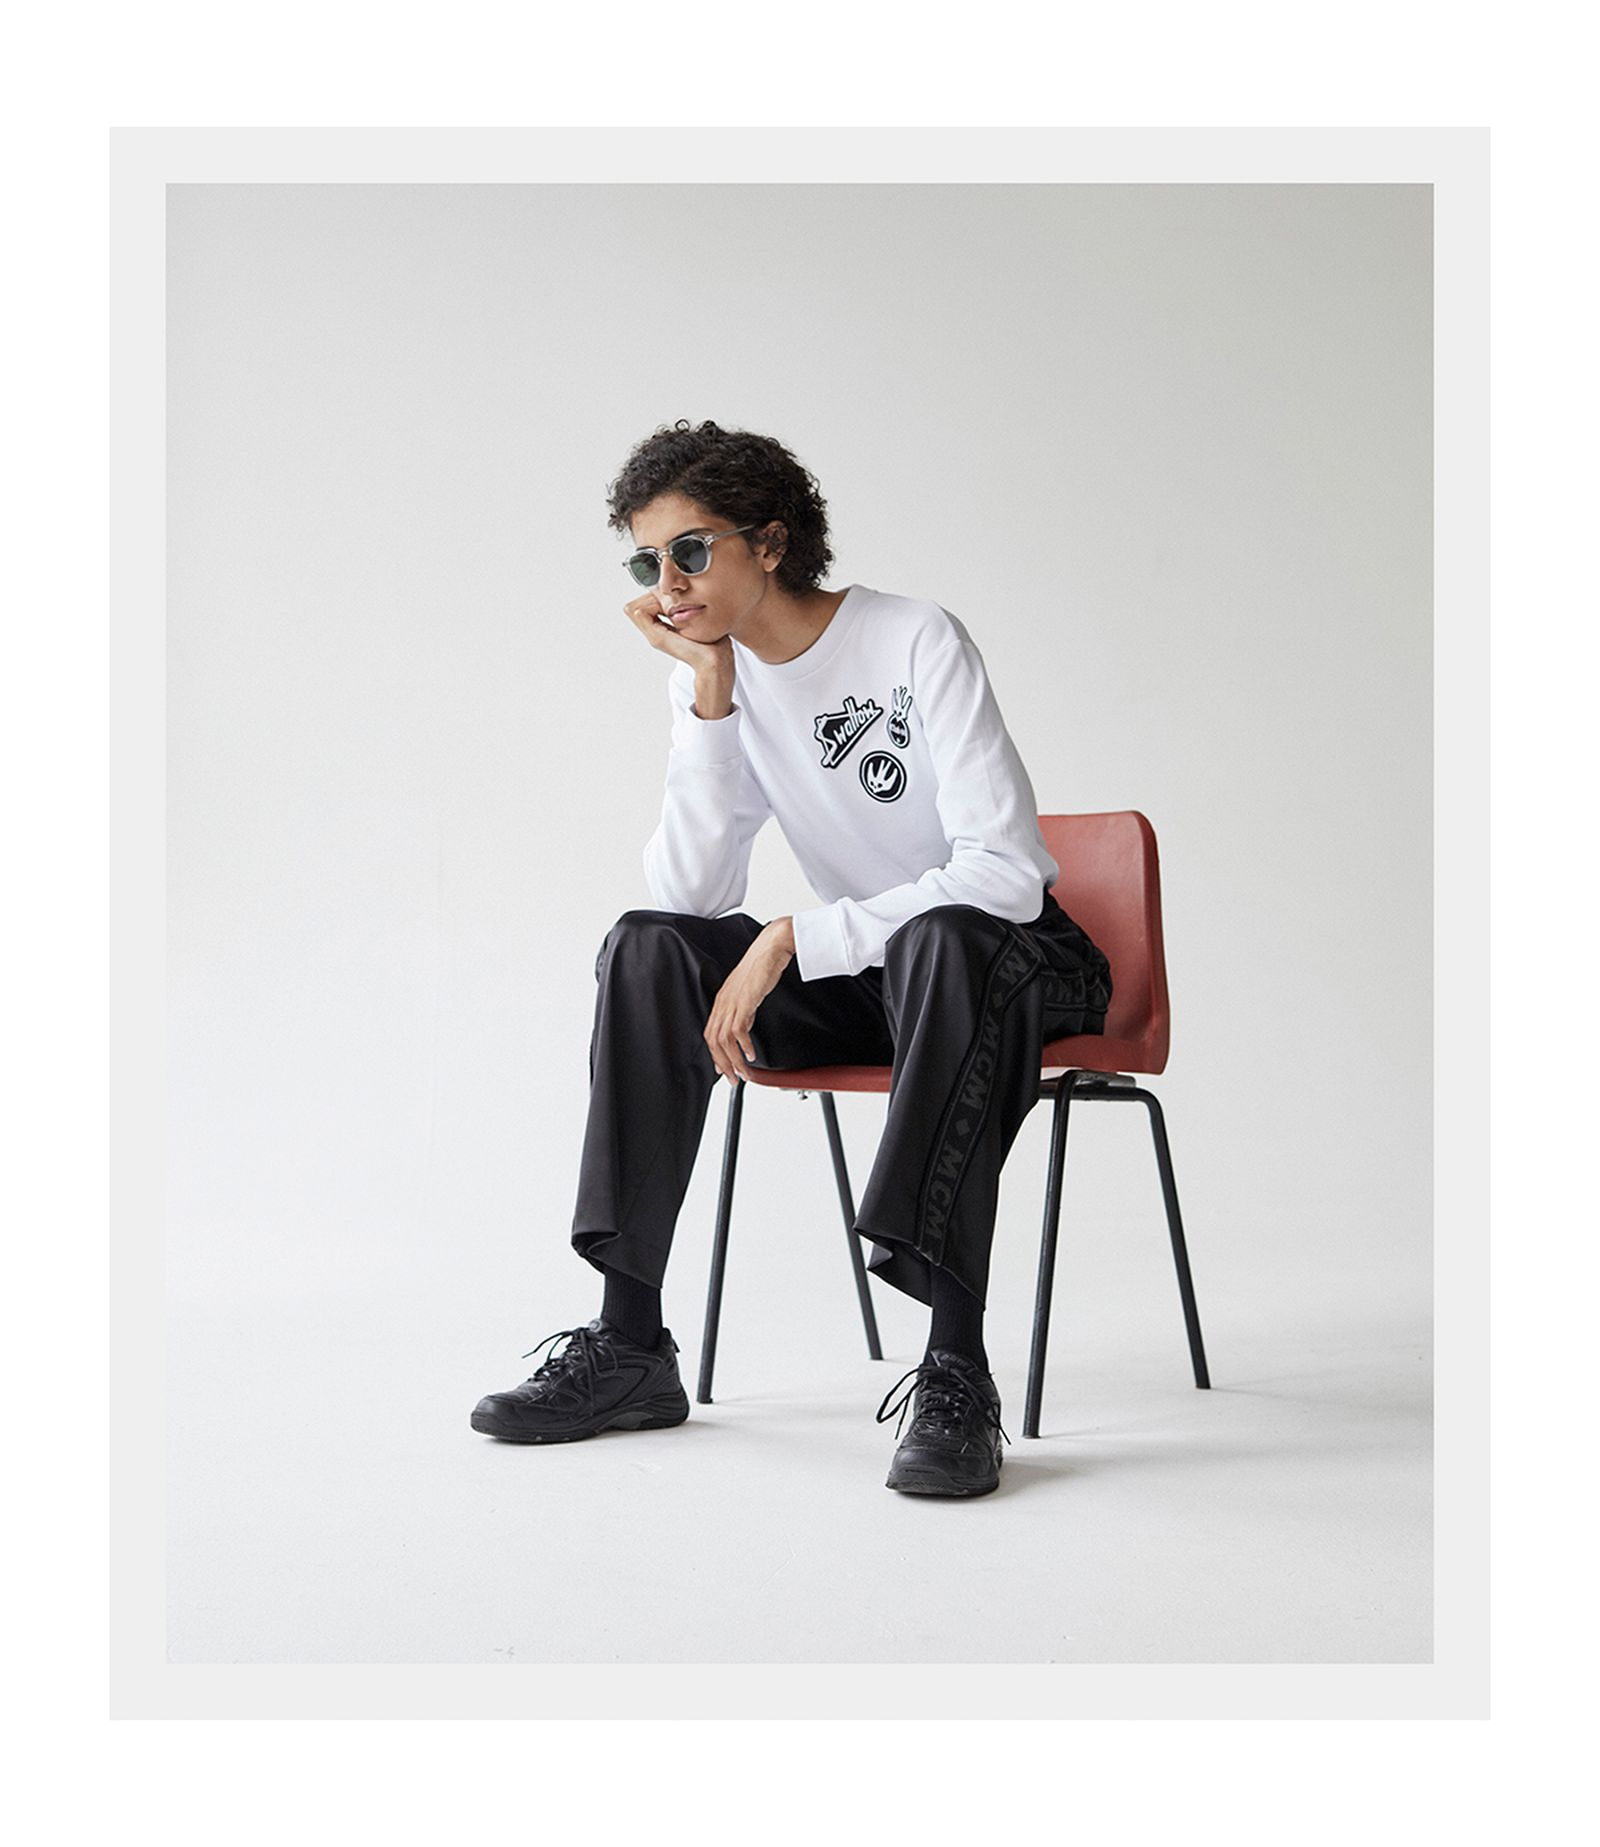 Sweater: McQ. Sweatpants: MCM. Sneakers. HI-TEC. Sunglasses: MOSCOT.